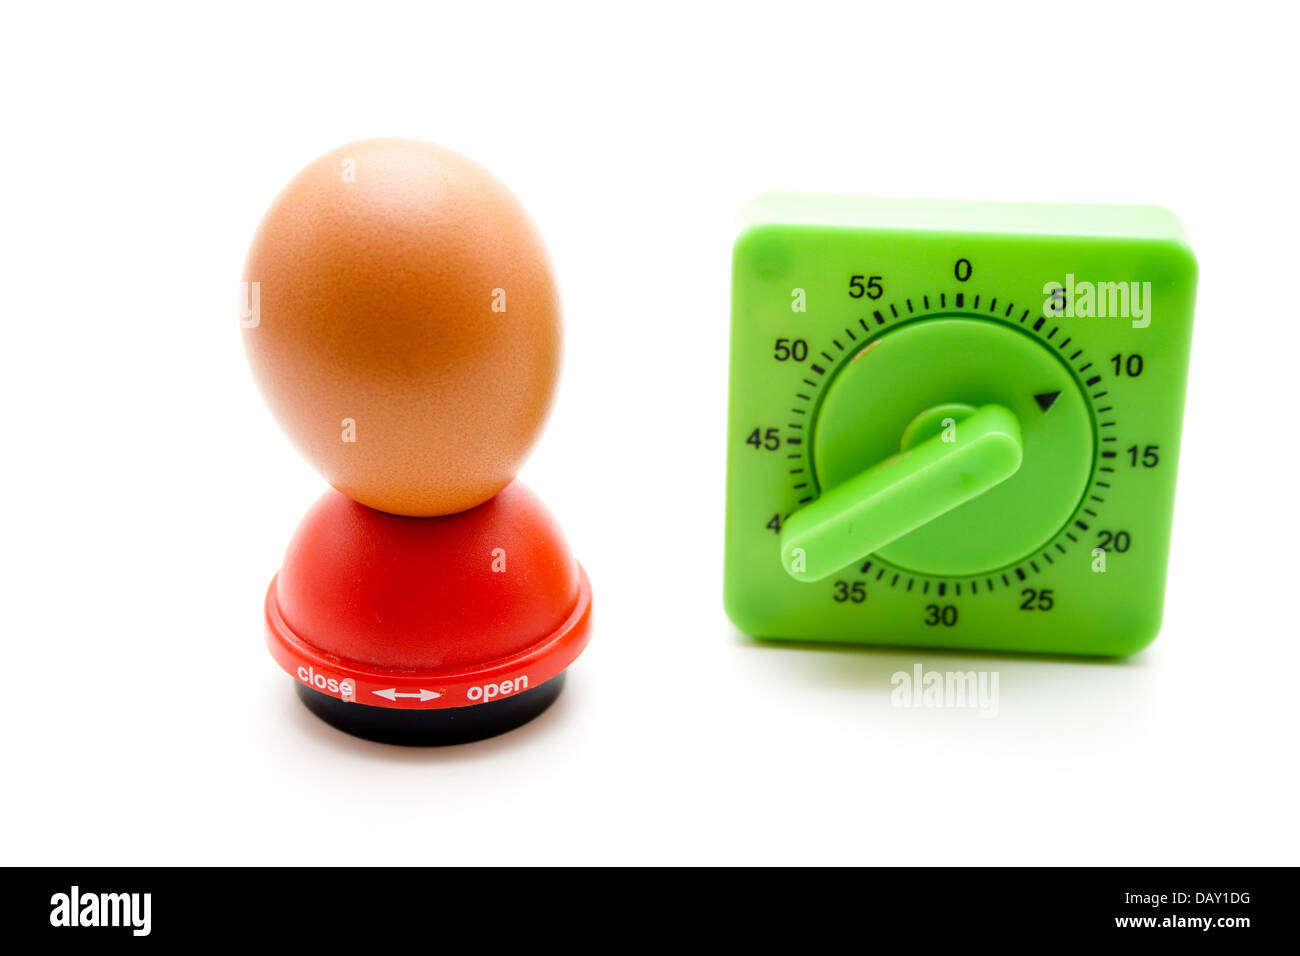 Egg timer with egg spike - Stock Image